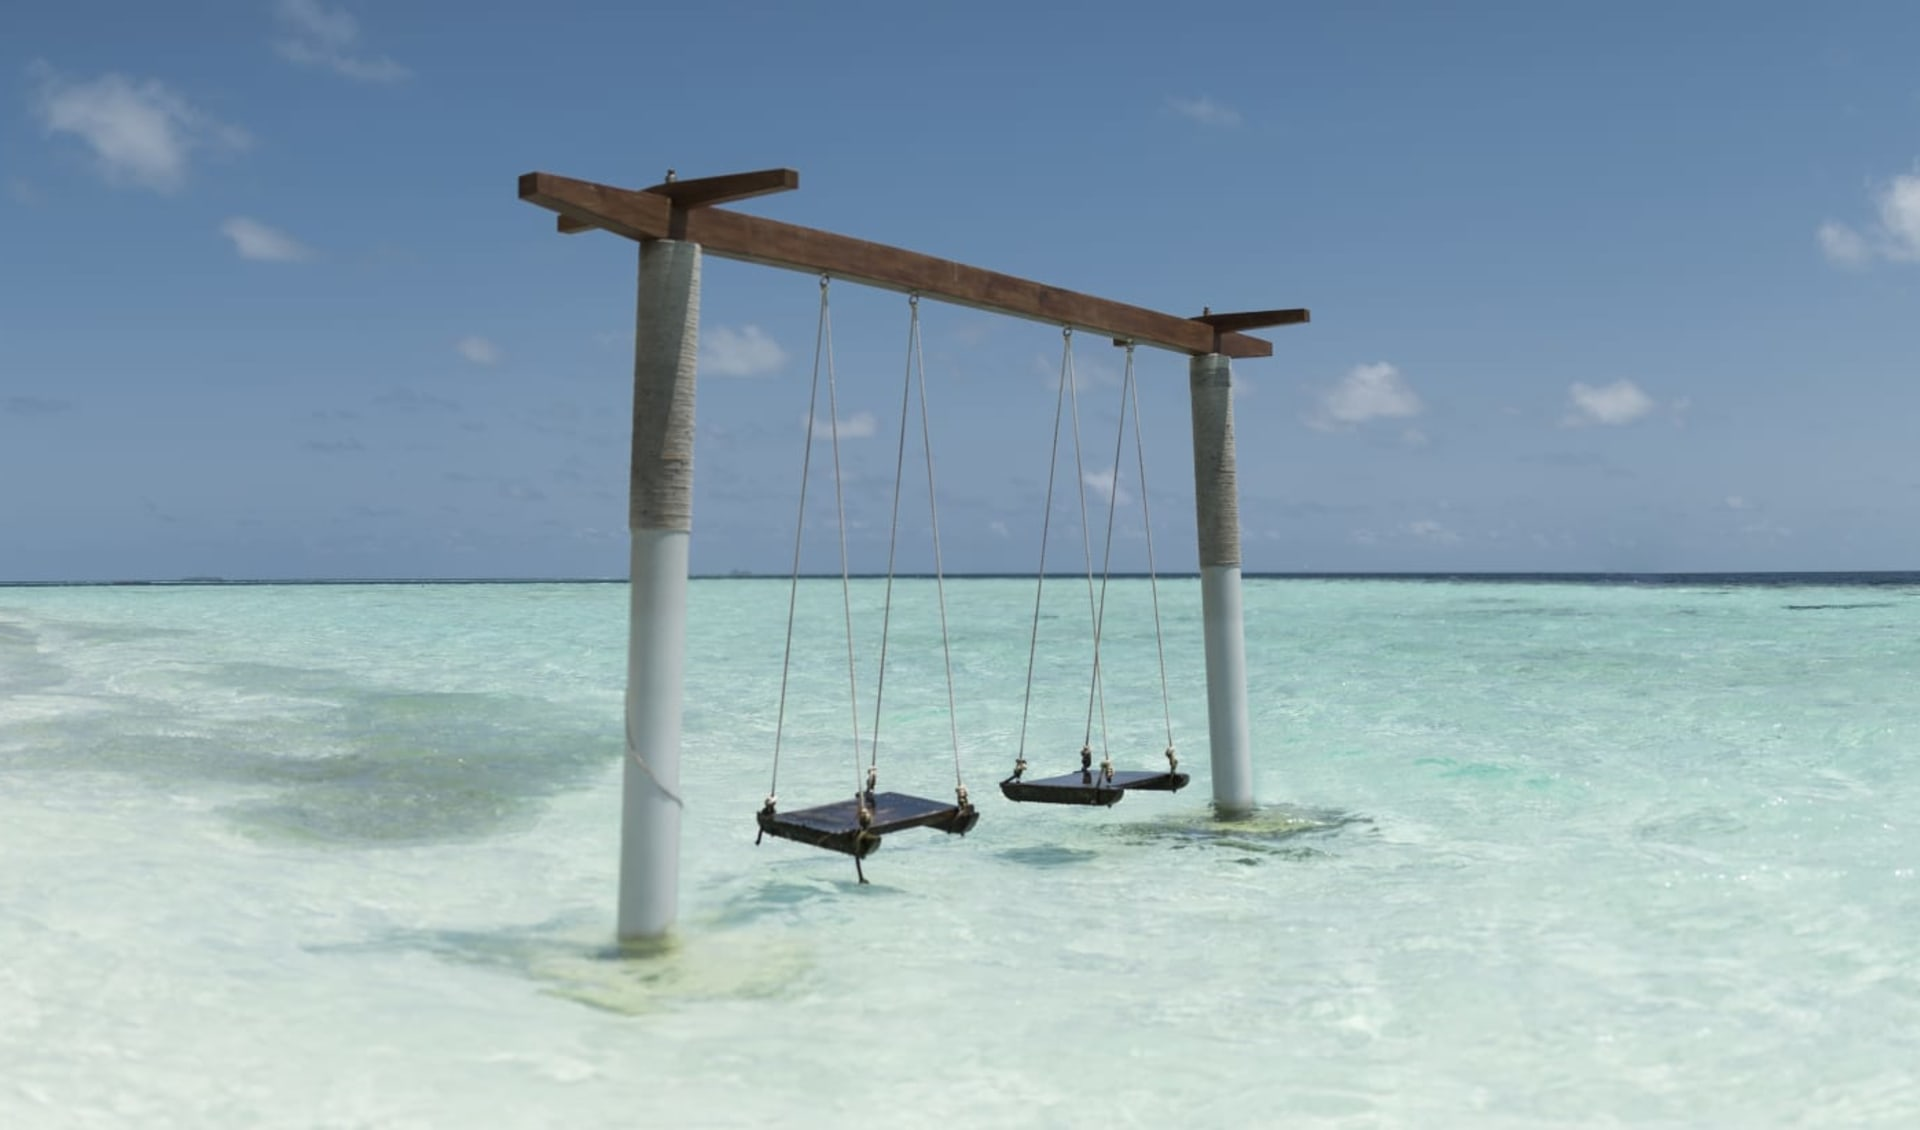 Biyadhoo Island Resort in Südmale-Atoll: